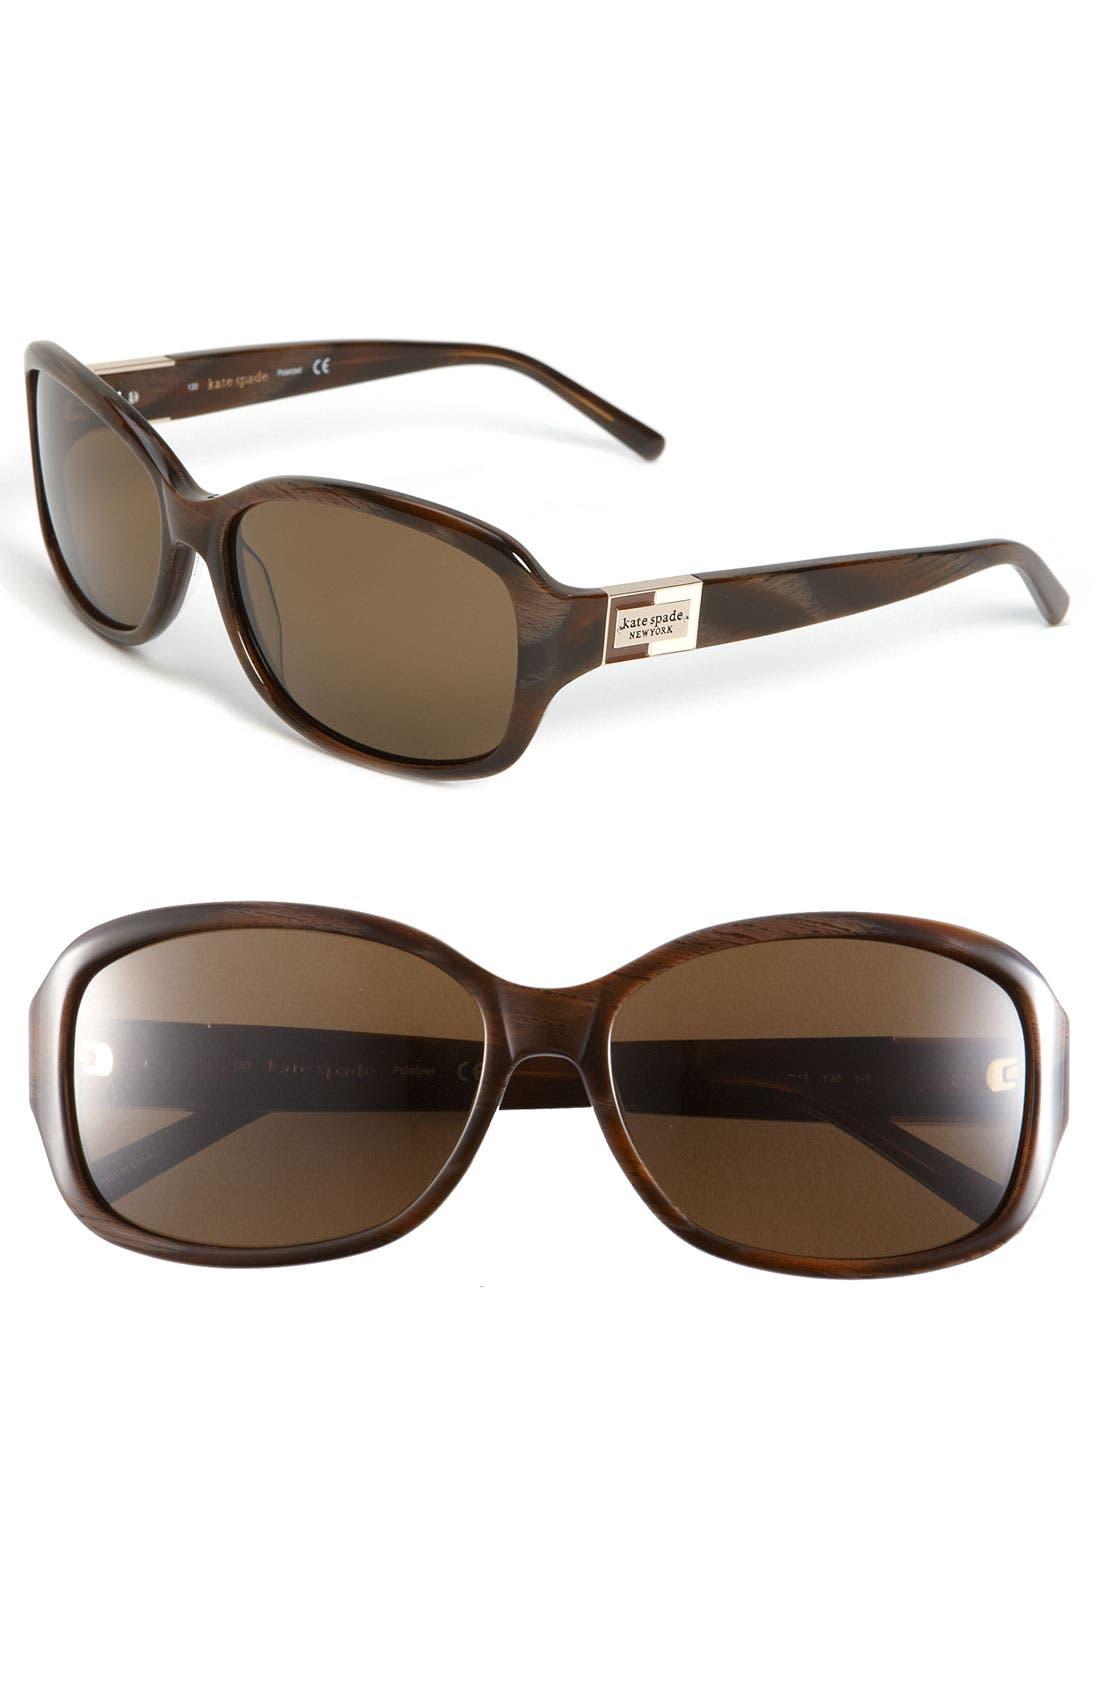 Main Image - kate spade new york 'annika' 56mm polarized rectangular sunglasses